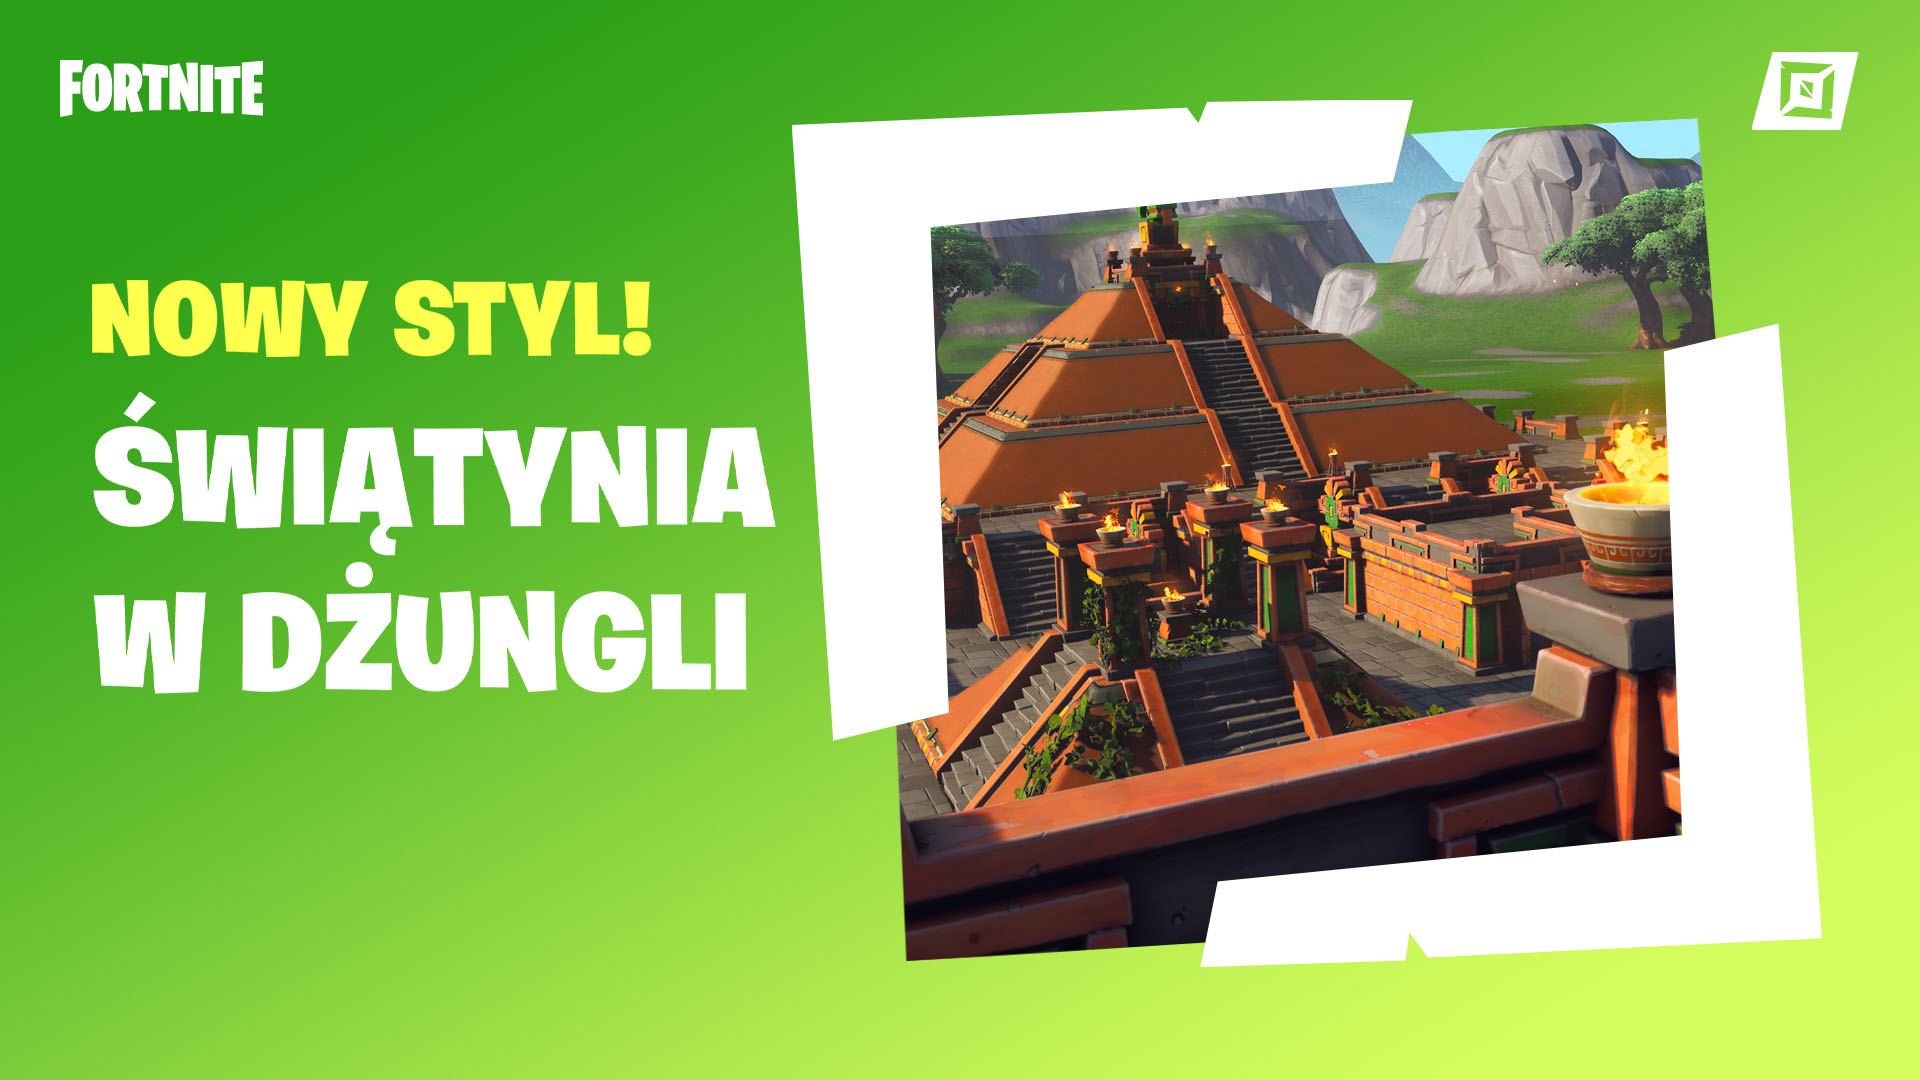 PL_08CM_Theme_JungleTemple_Social.jpg